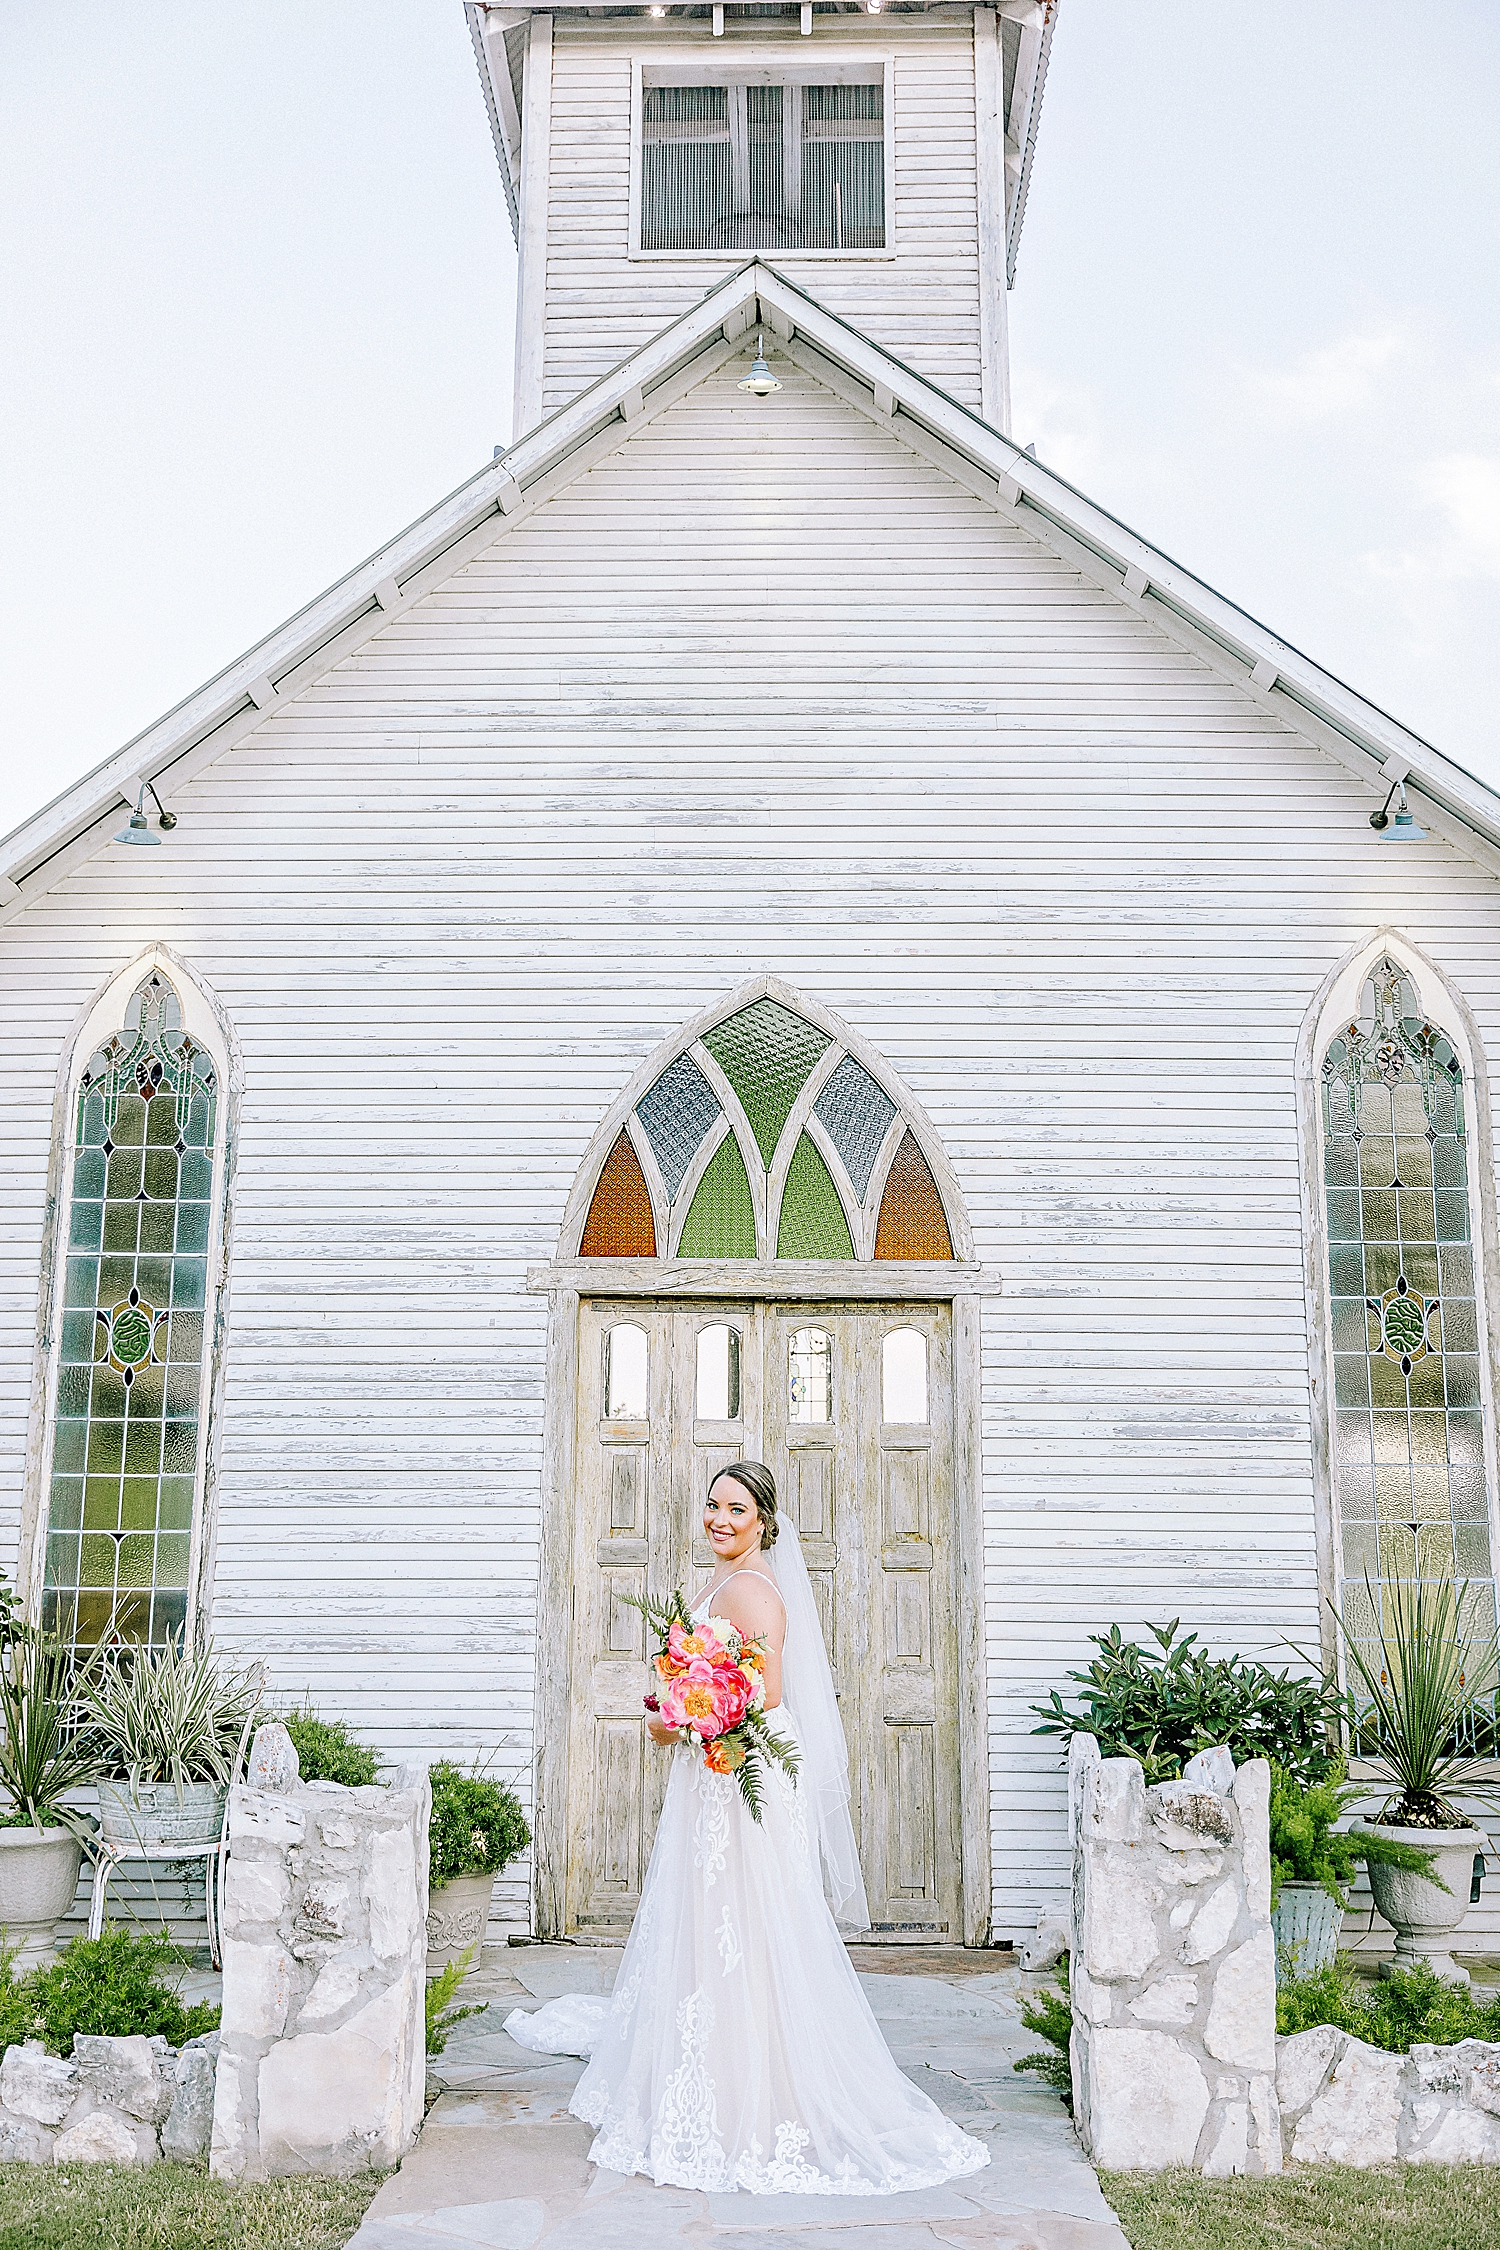 Gruene-Estate-Wedding-New-Braunfels-Bride-Bridal-Photos-Carly-Barton-Photography_0013.jpg